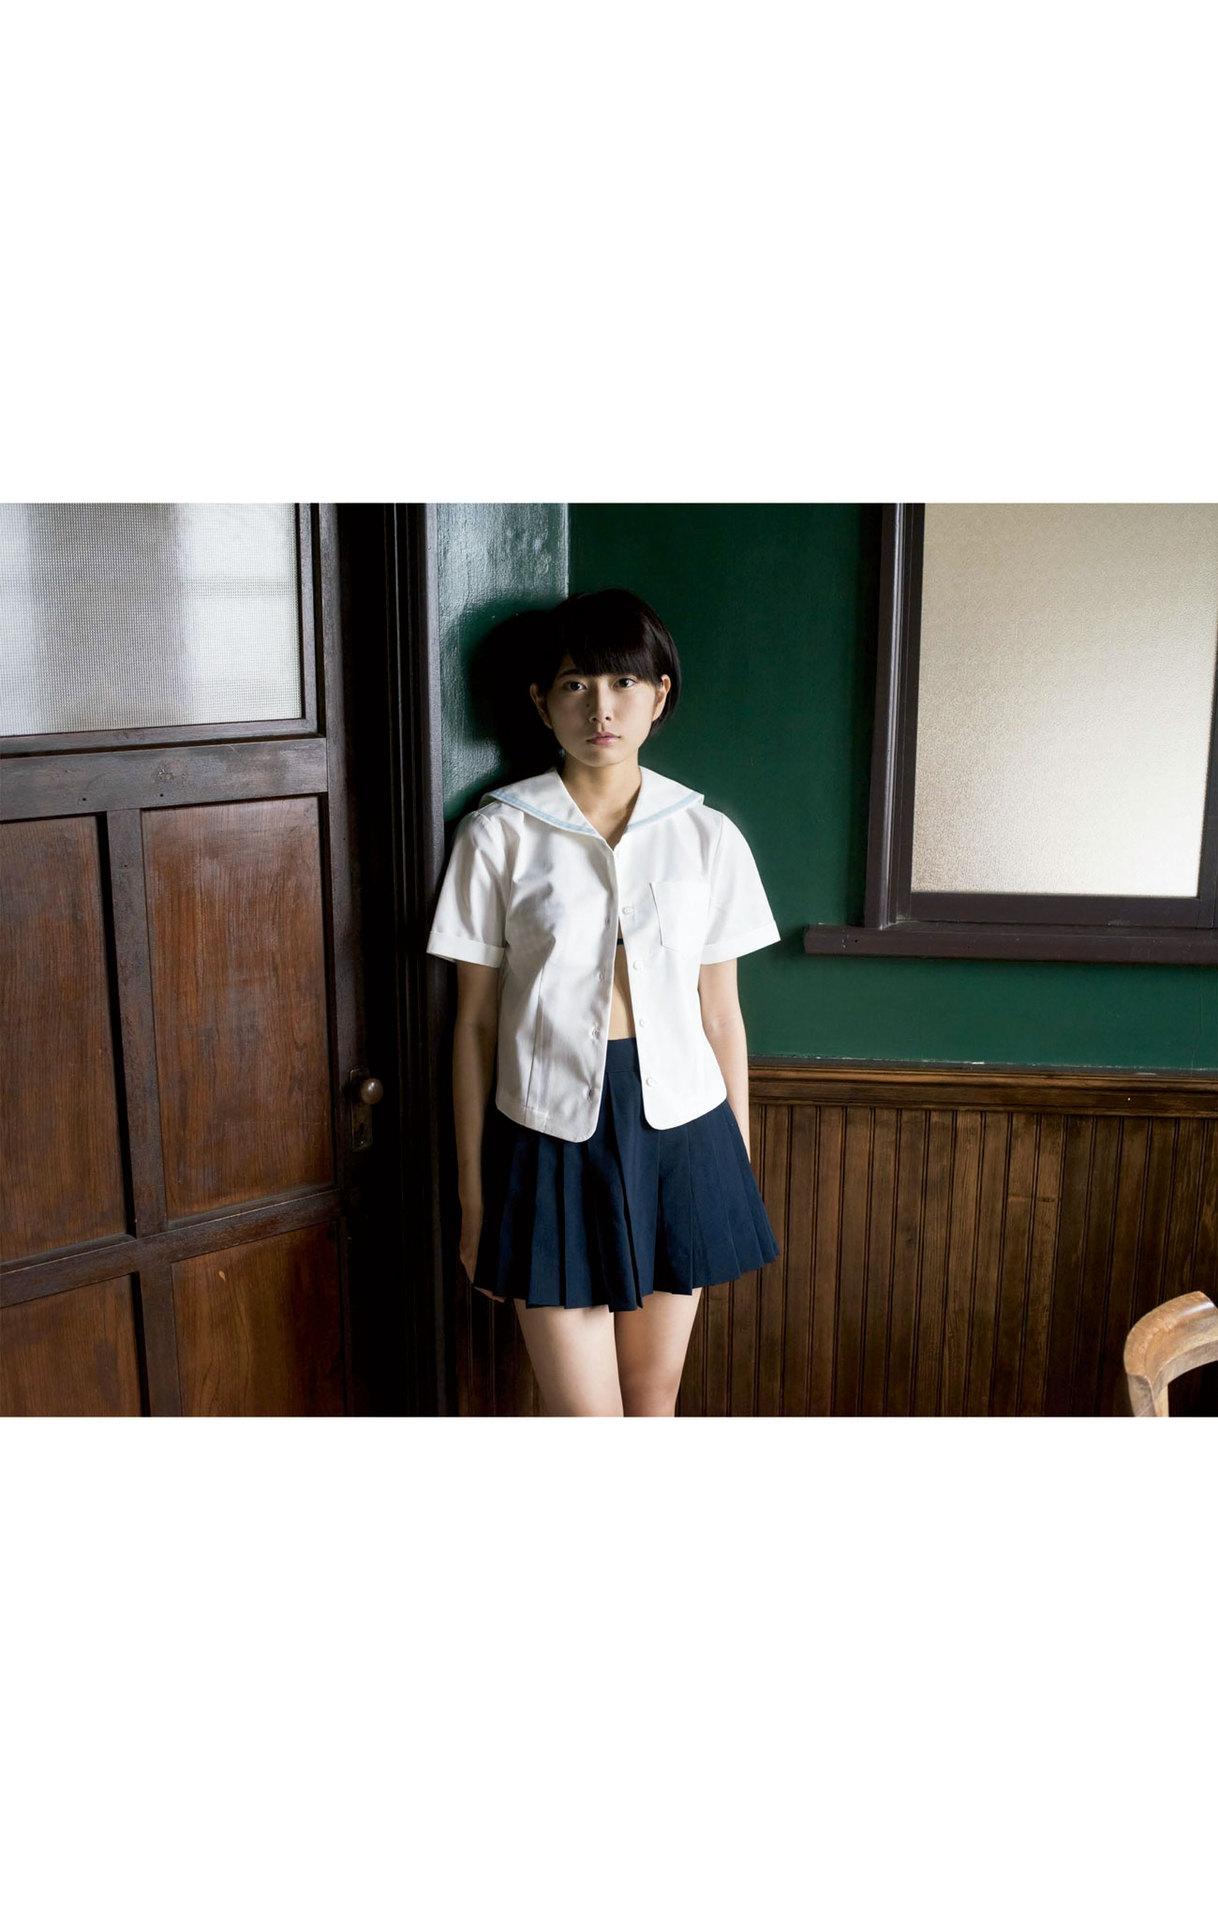 Summer Vacation Uniform After School Youth Bikini057